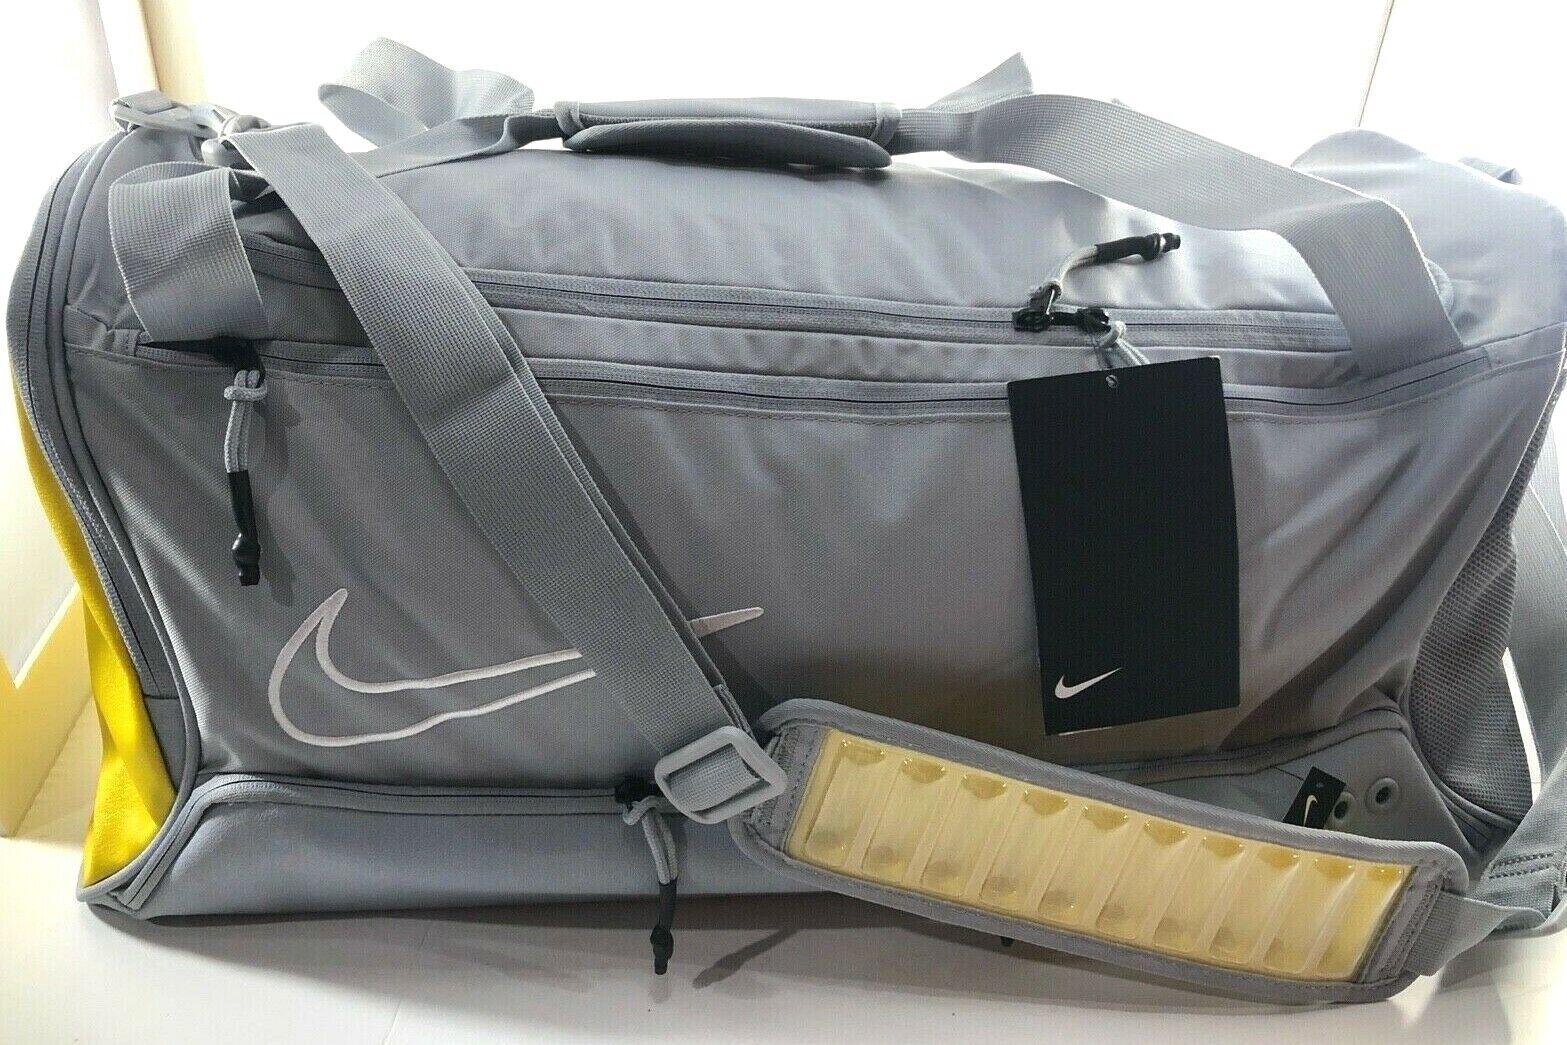 Nike Elite Basketball Duffle Gym Bag BA6163-012 Cool Grey Yellow Air Max